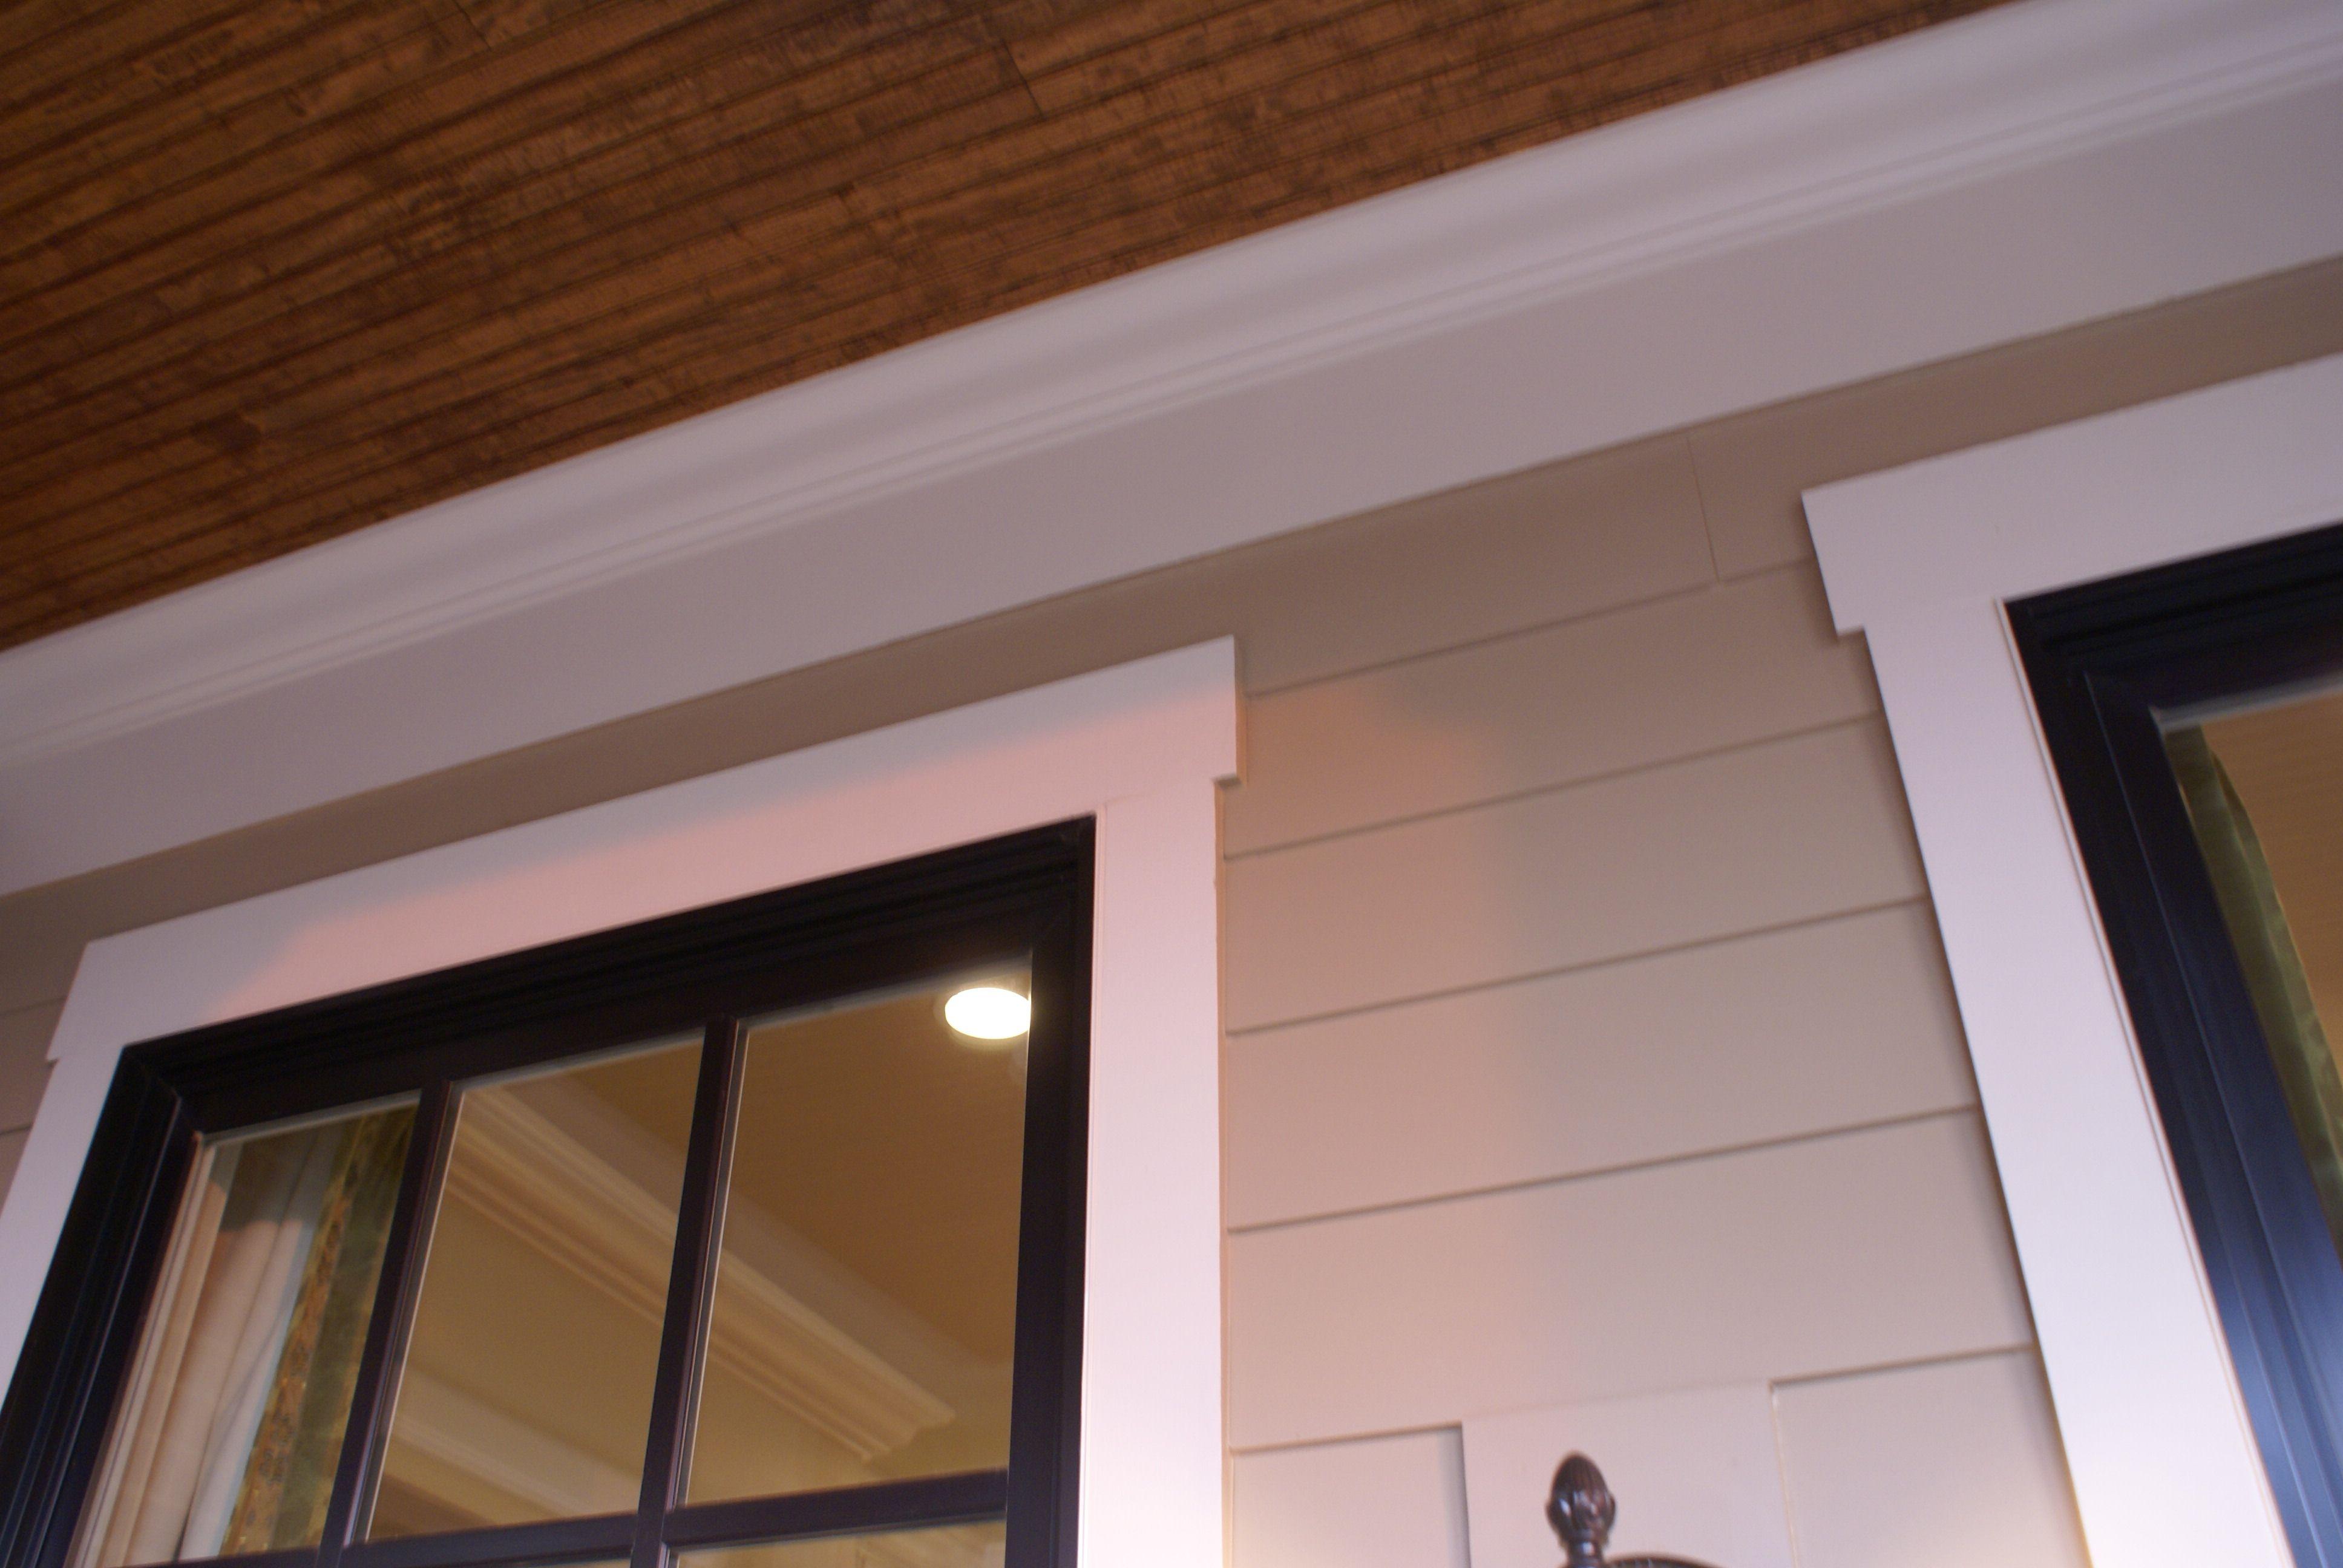 exterior window trim detail new patchen wilkes details house cladding black window frames. Black Bedroom Furniture Sets. Home Design Ideas